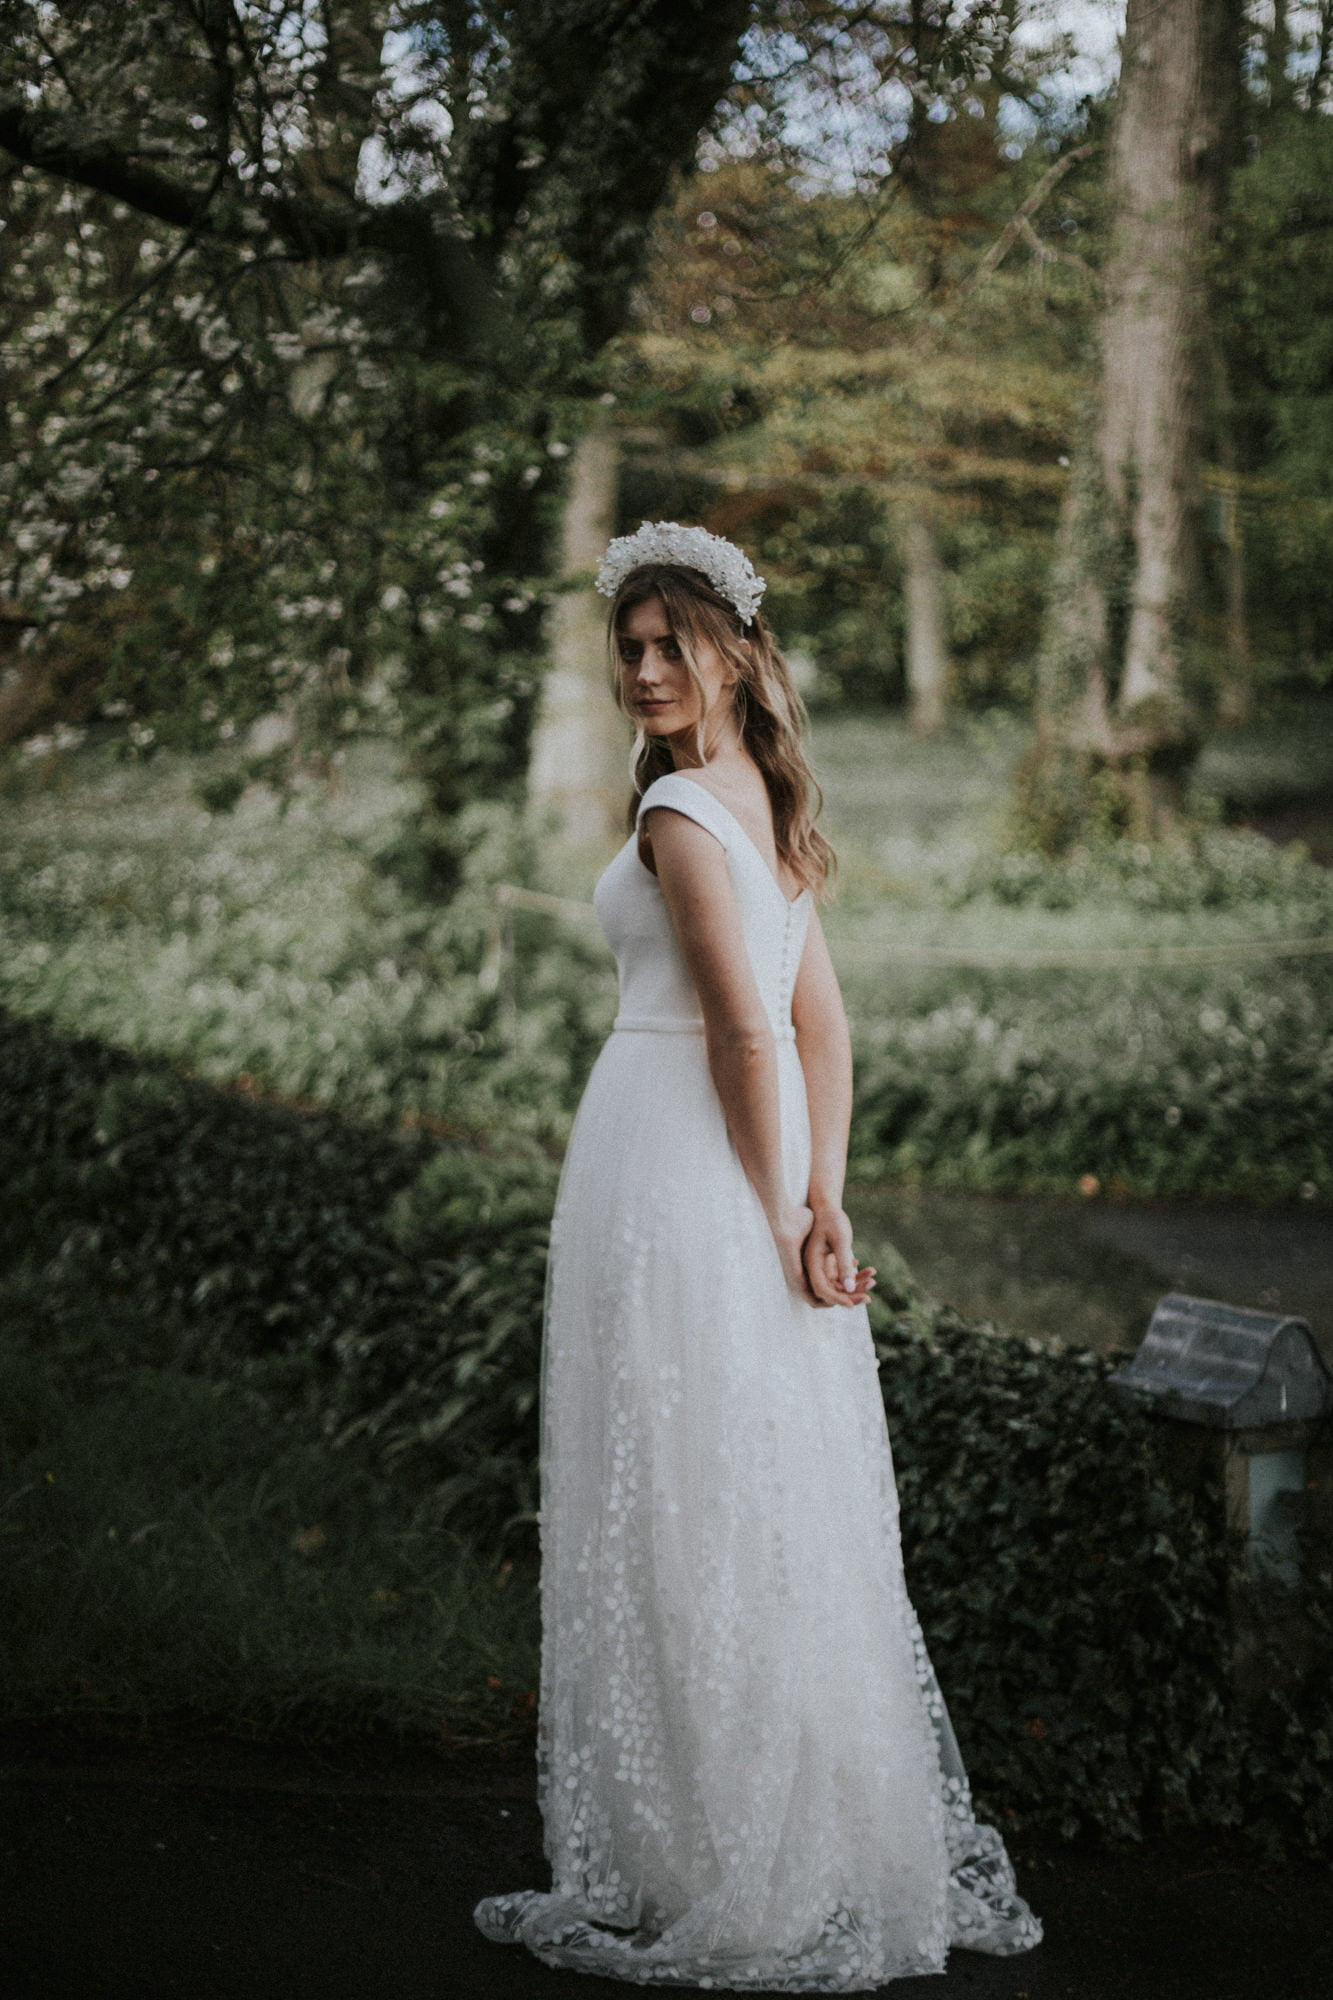 Oscar Lili - Boho Wedding Dresses, Backhouse Rossie Wedding Venue